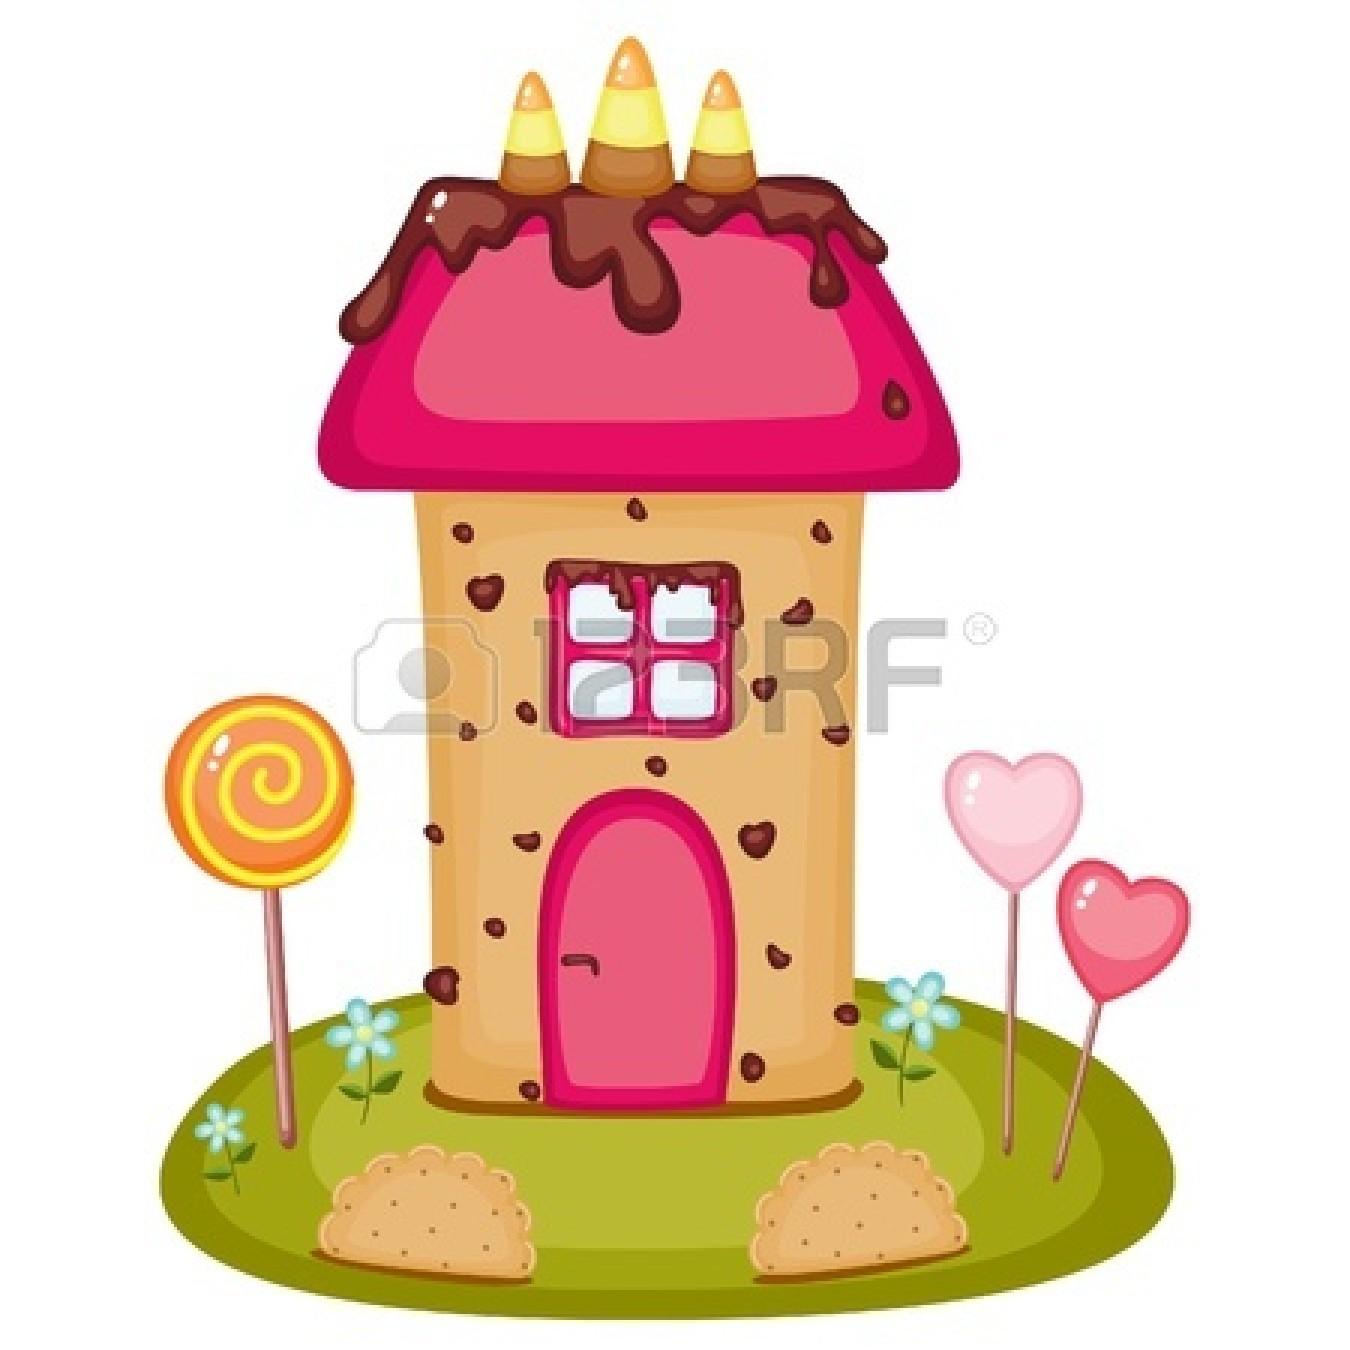 1350x1350 Sugar Cookie Clipart 14832060 Candy House Yanhe Clip Art